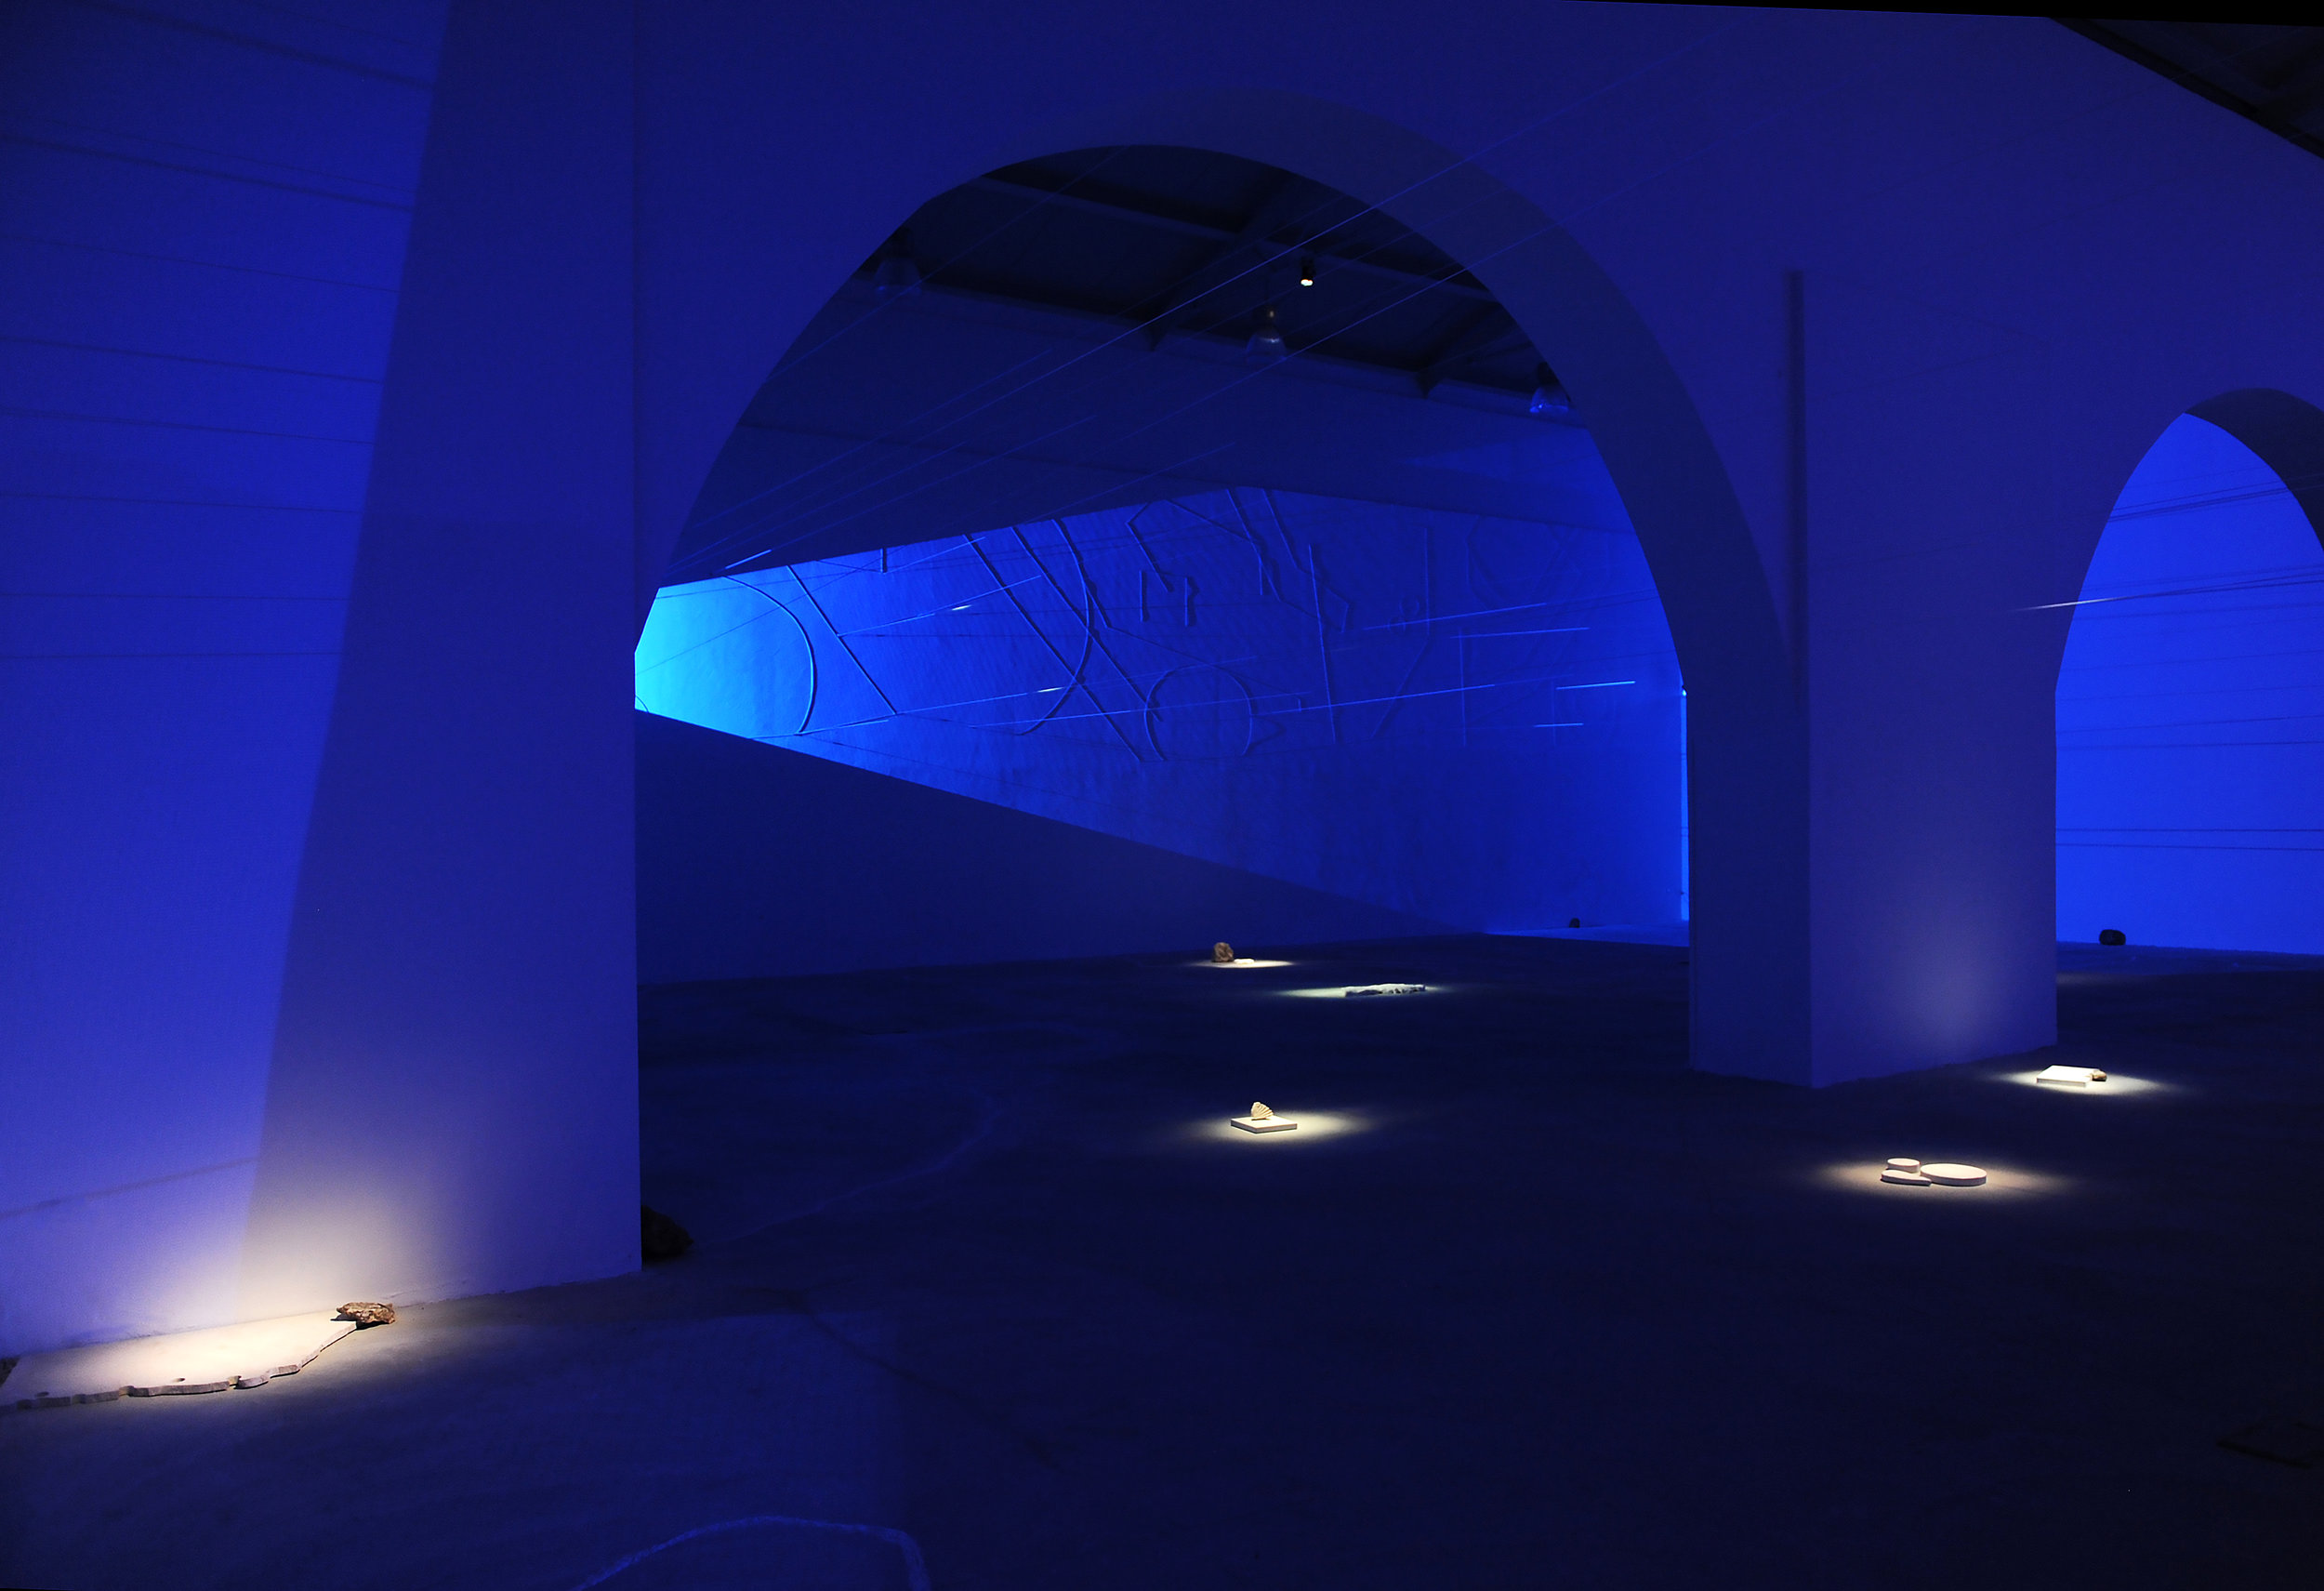 Installation view of   Intimacies (Mediterranean Civilization  ), Fondazione Brodbeck, Catania, Italy